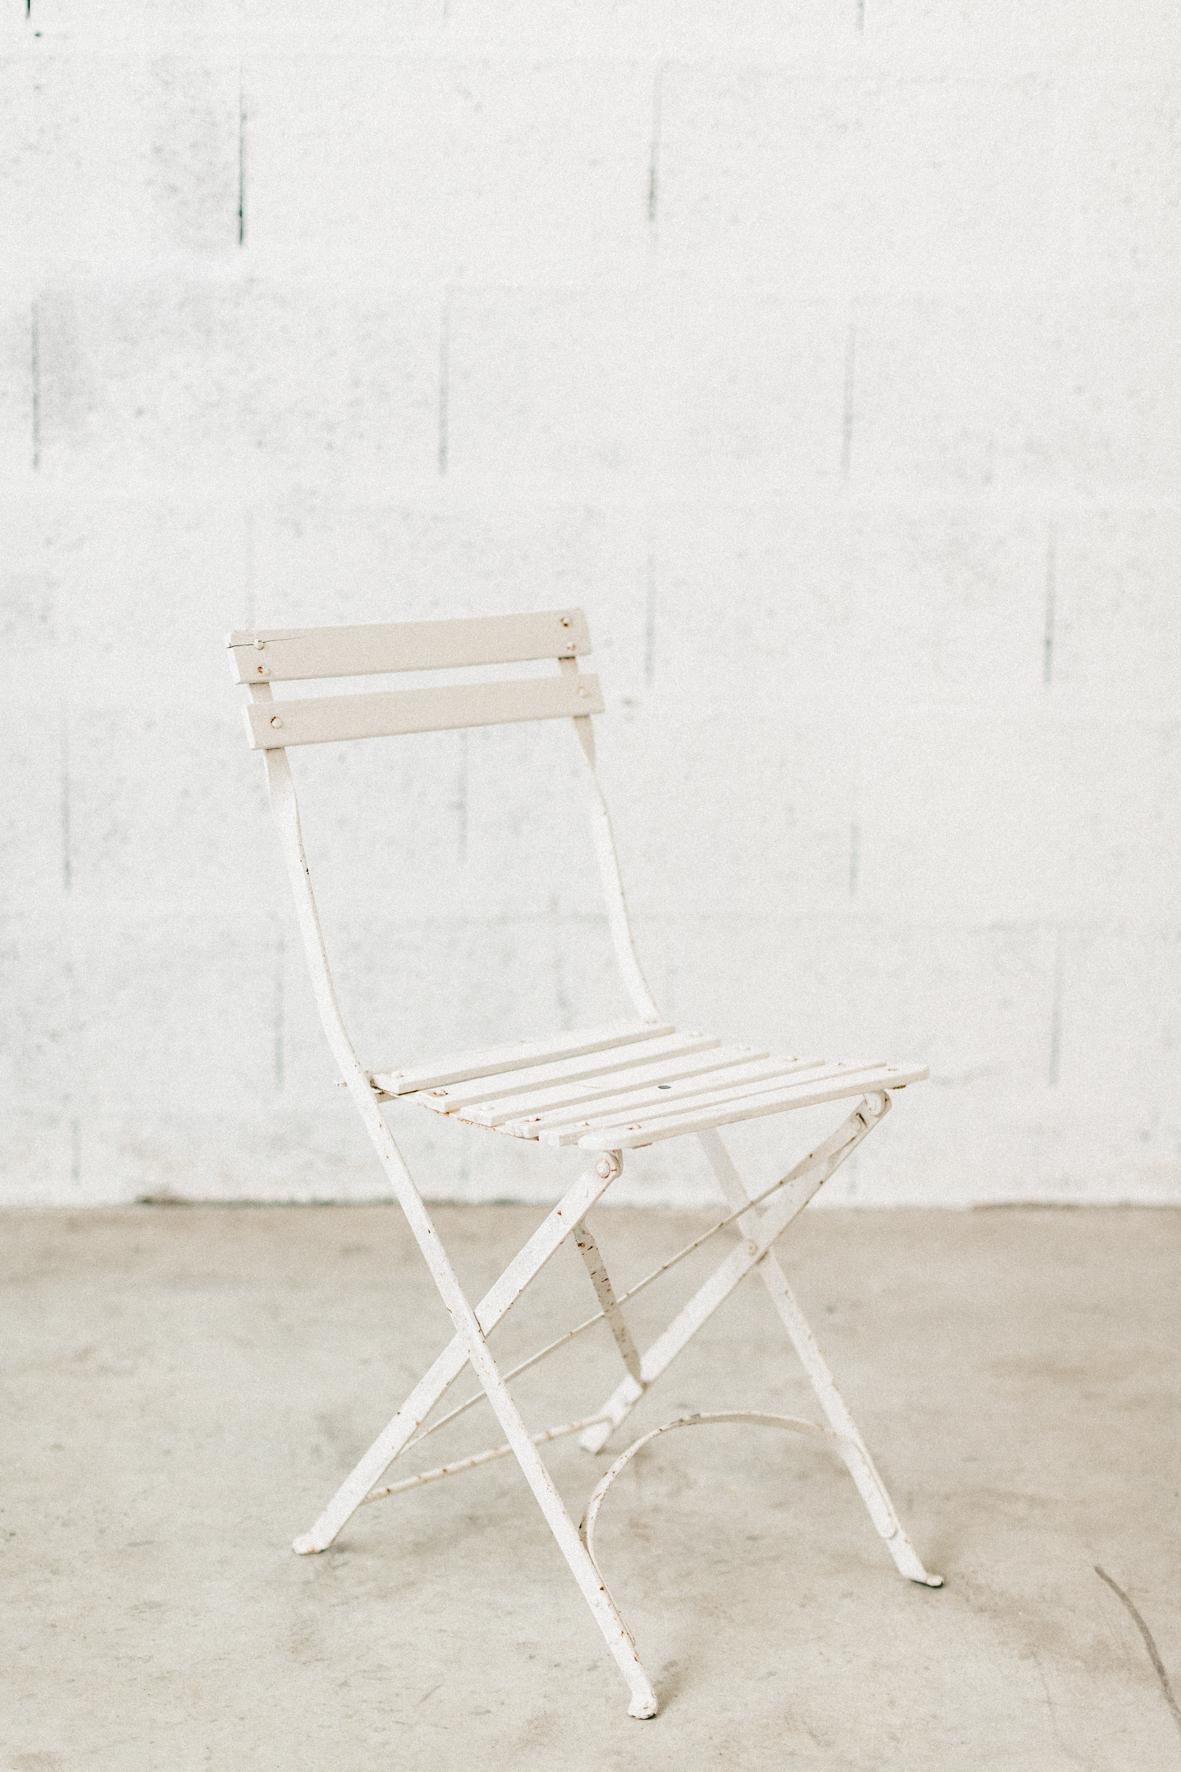 Chaise De Jardin Blanche Pliante encequiconcerne Chaise De Jardin Blanche